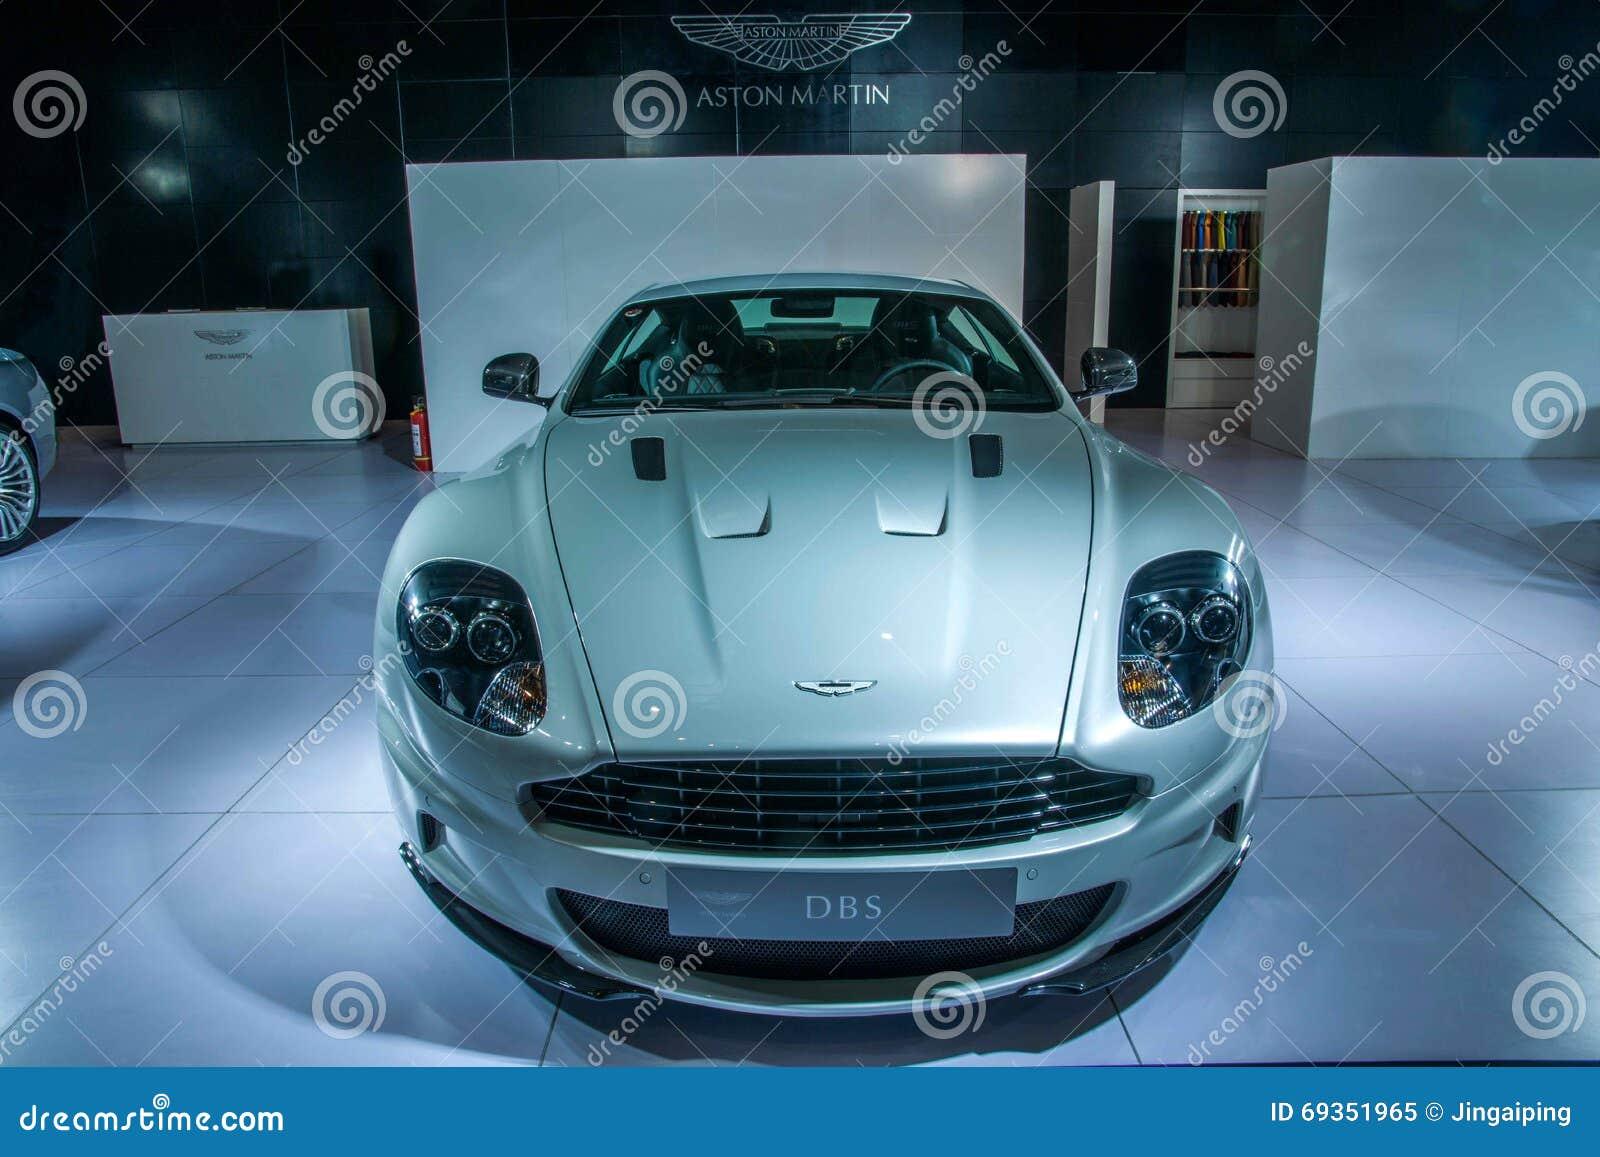 Aston Martin Car Series Editorial Image Image Of Journey 69351965